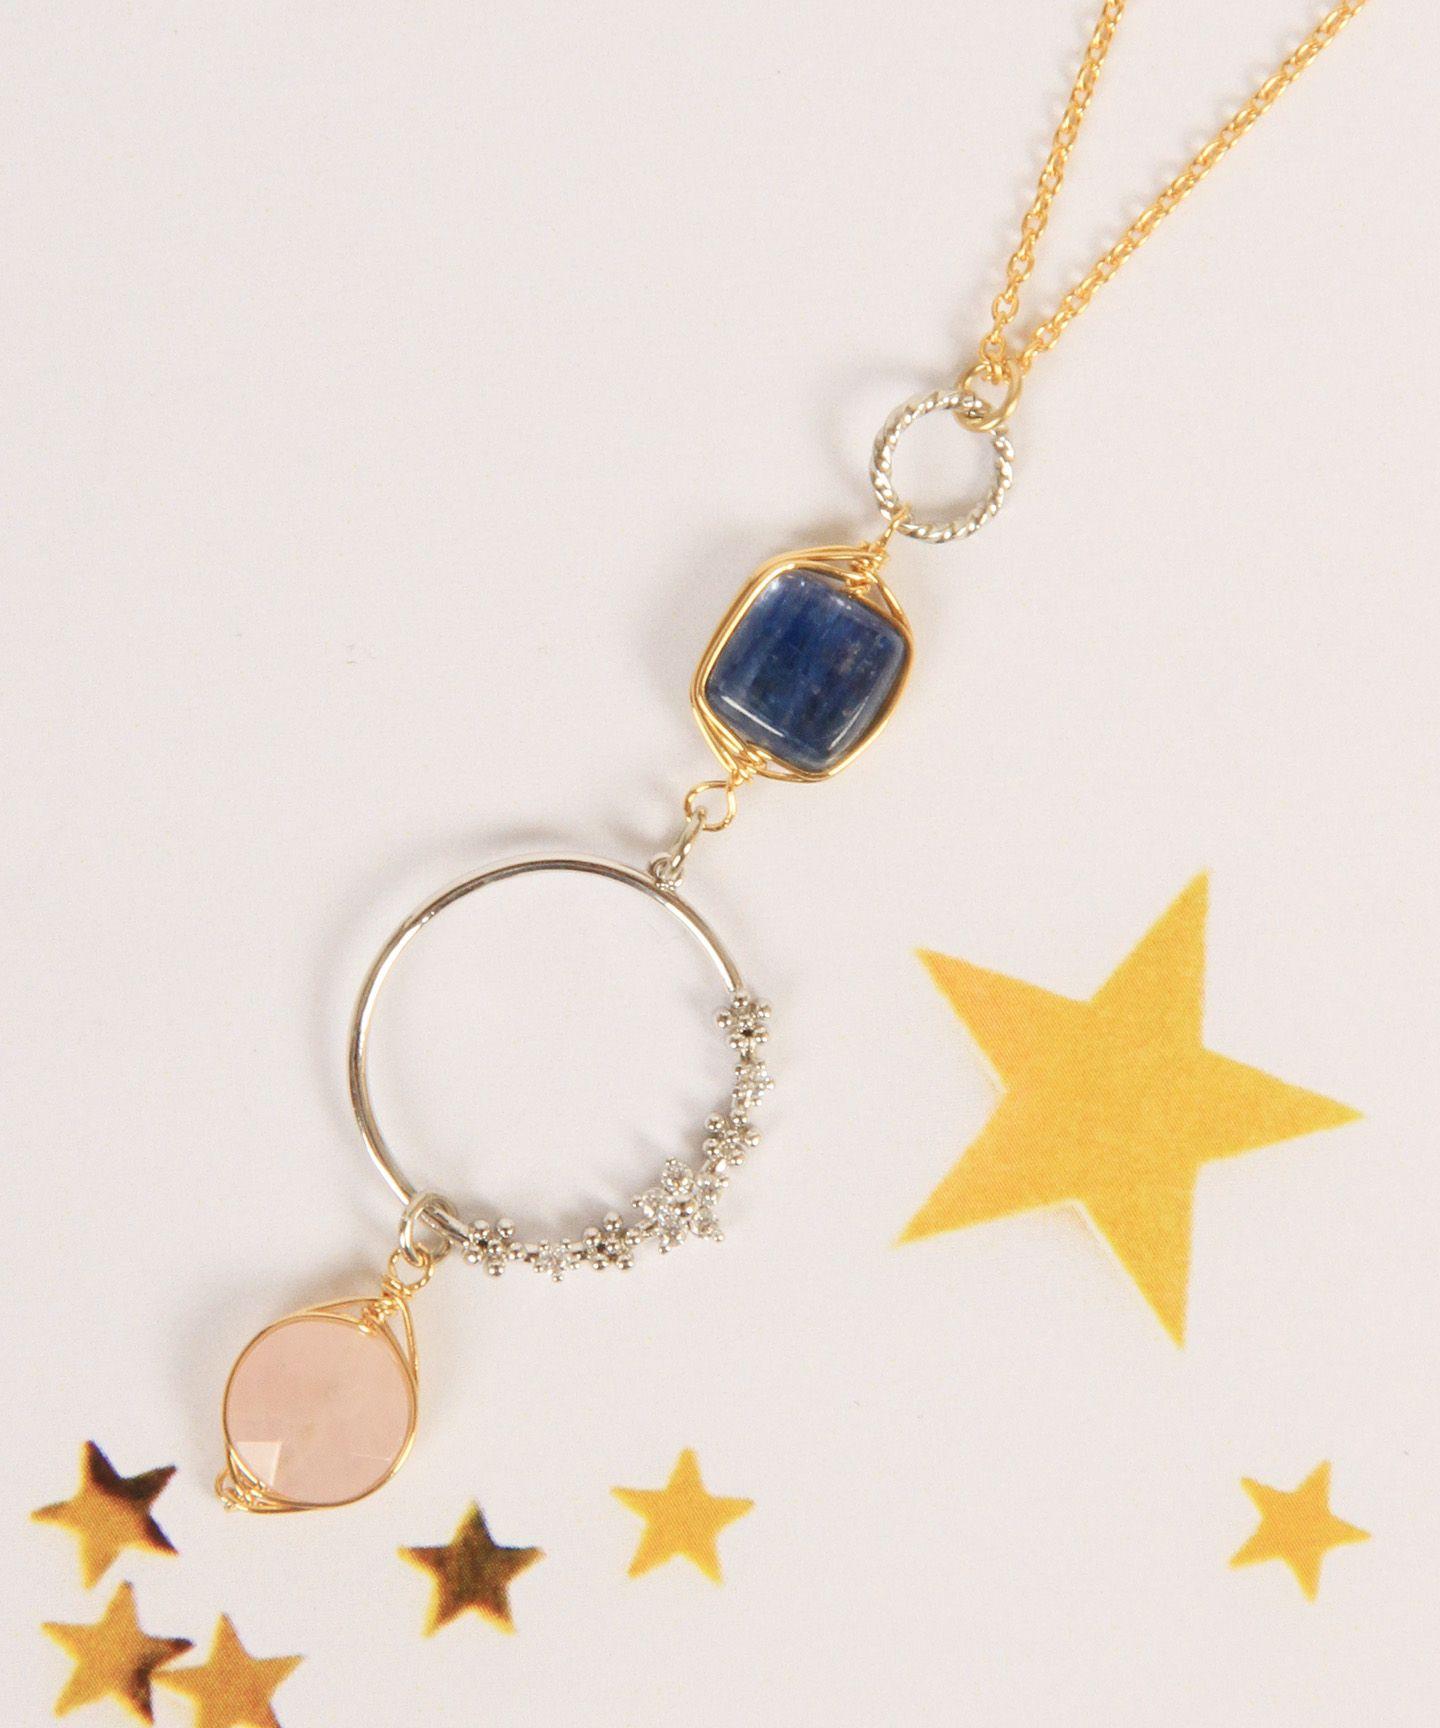 WYTHE CHARM(ワイスチャーム)/【ゴールド×シルバー】K14GF 花リングピンク×ブルーネックレス